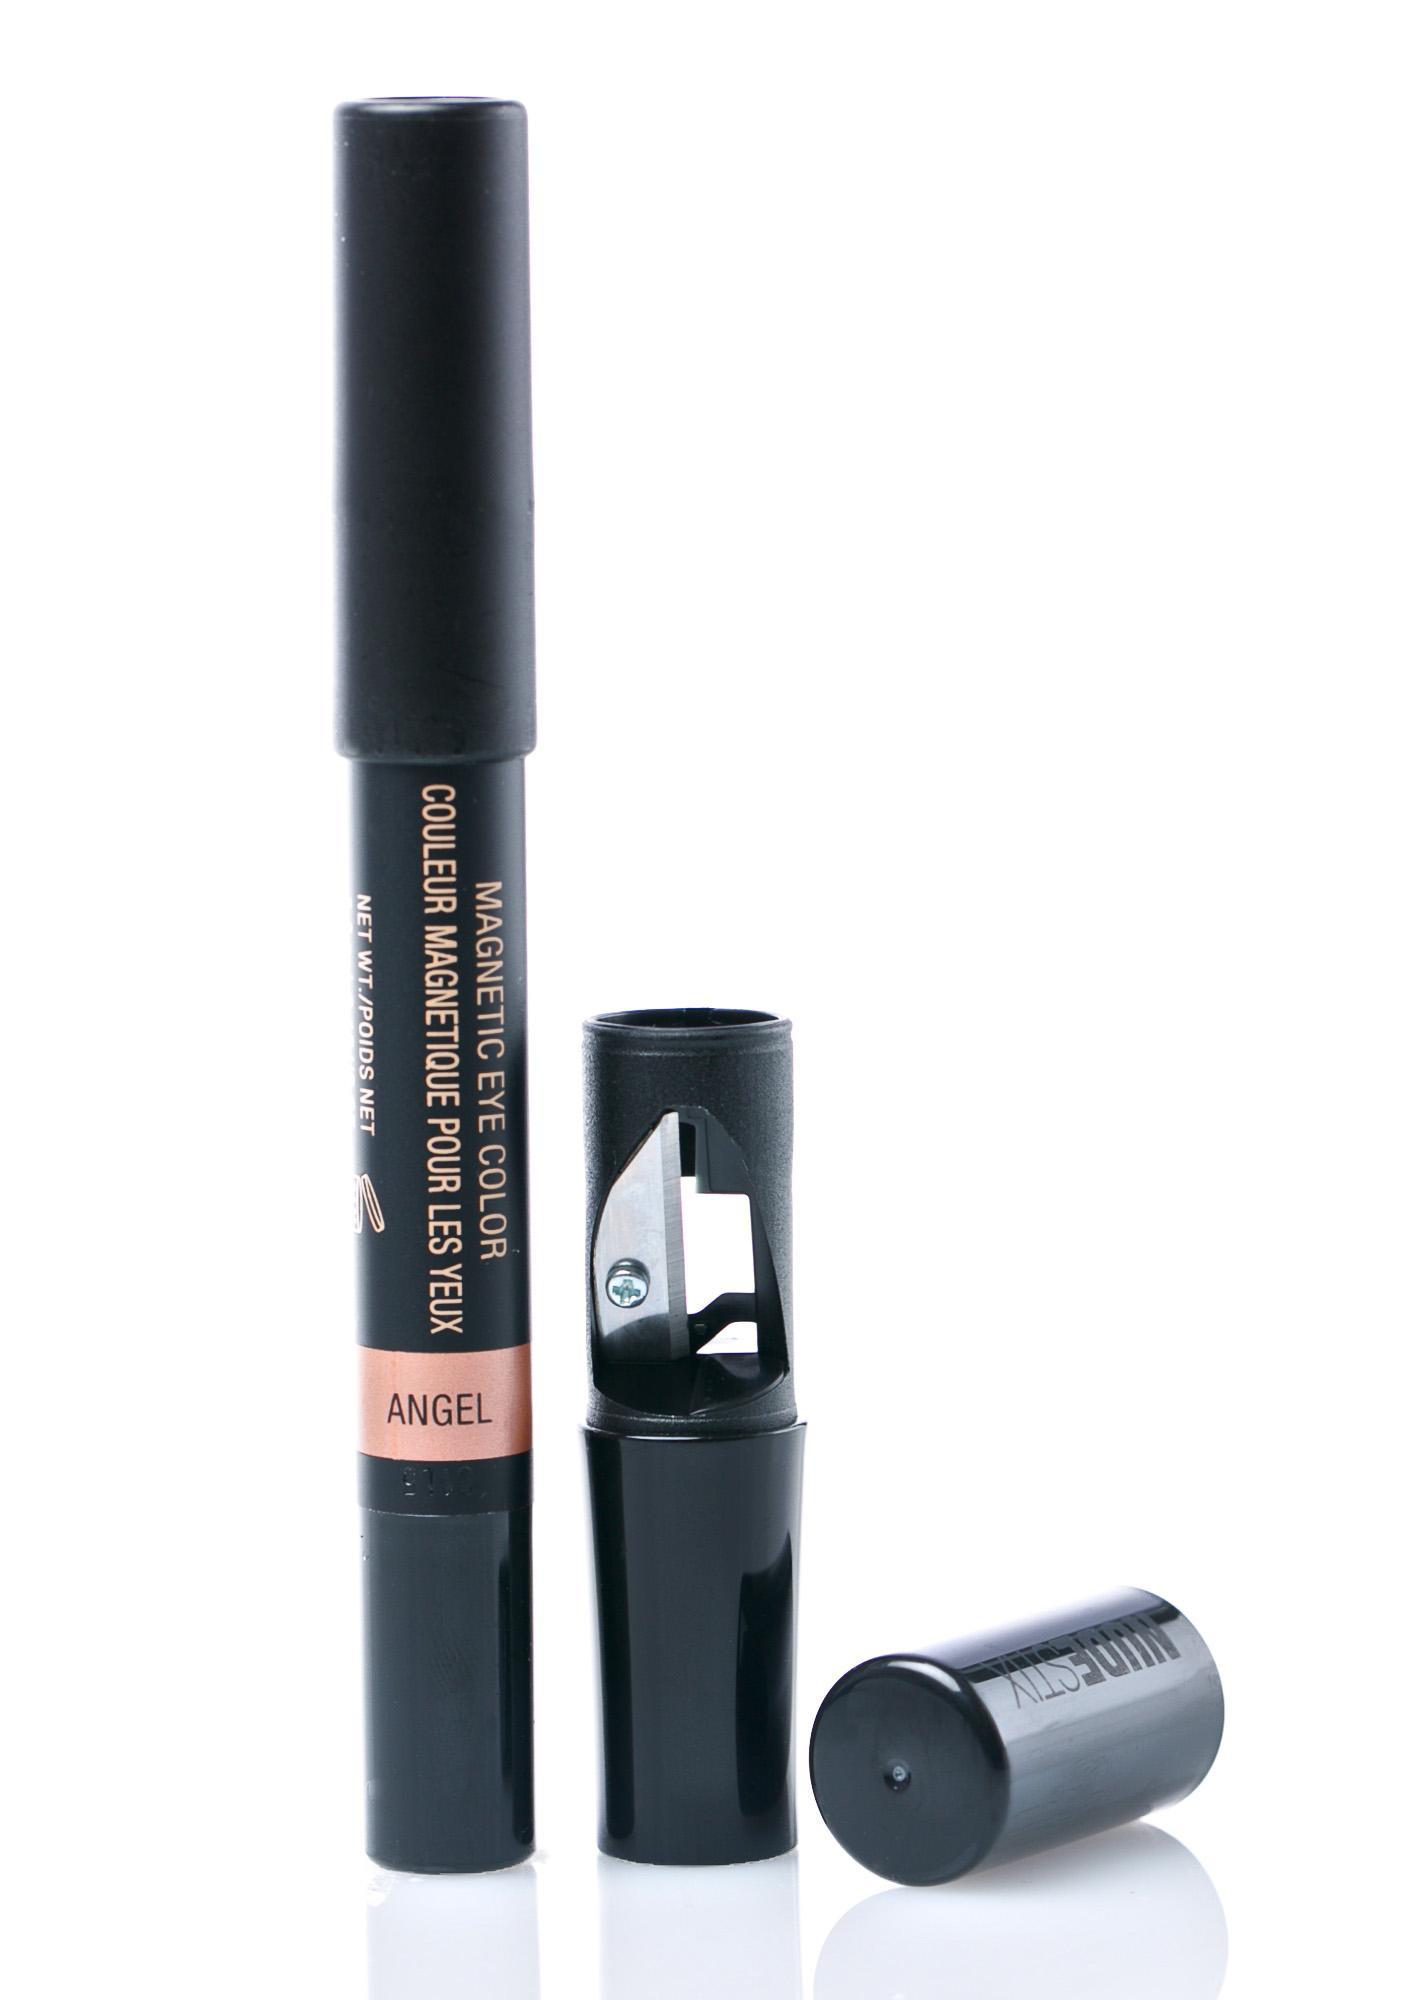 Nudestix Angel Magnetic Eye Pencil